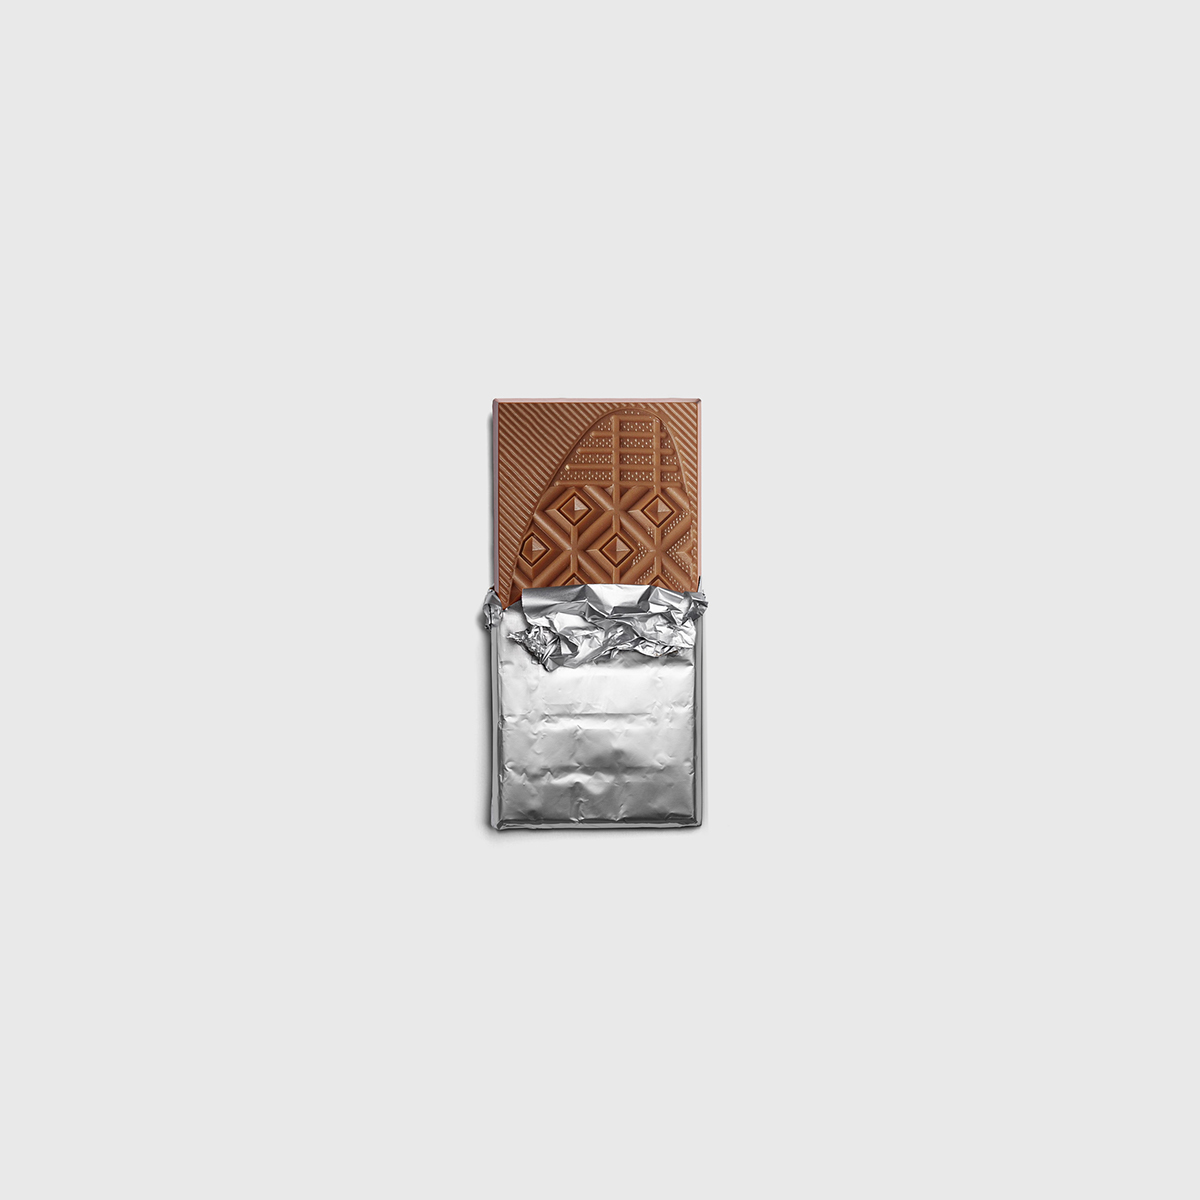 sole chocolate bar photo montage photoshop